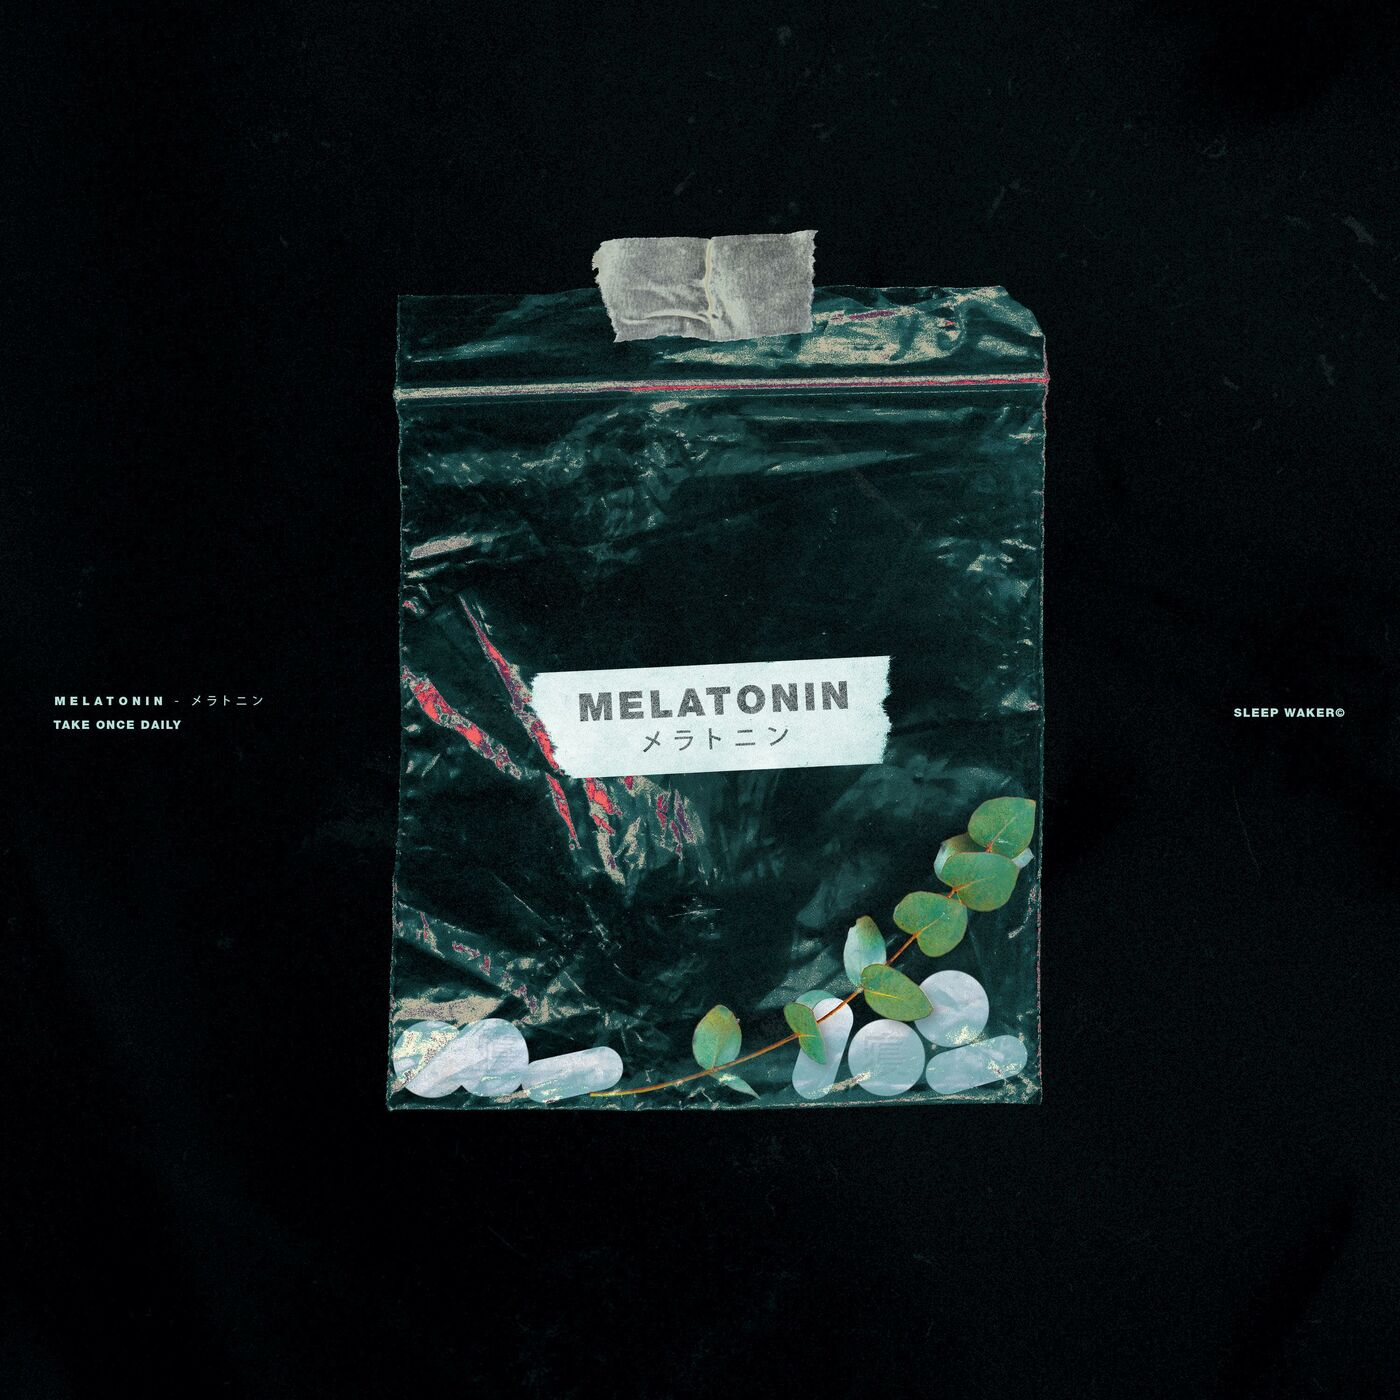 Sleep Waker - Melatonin [single] (2019)